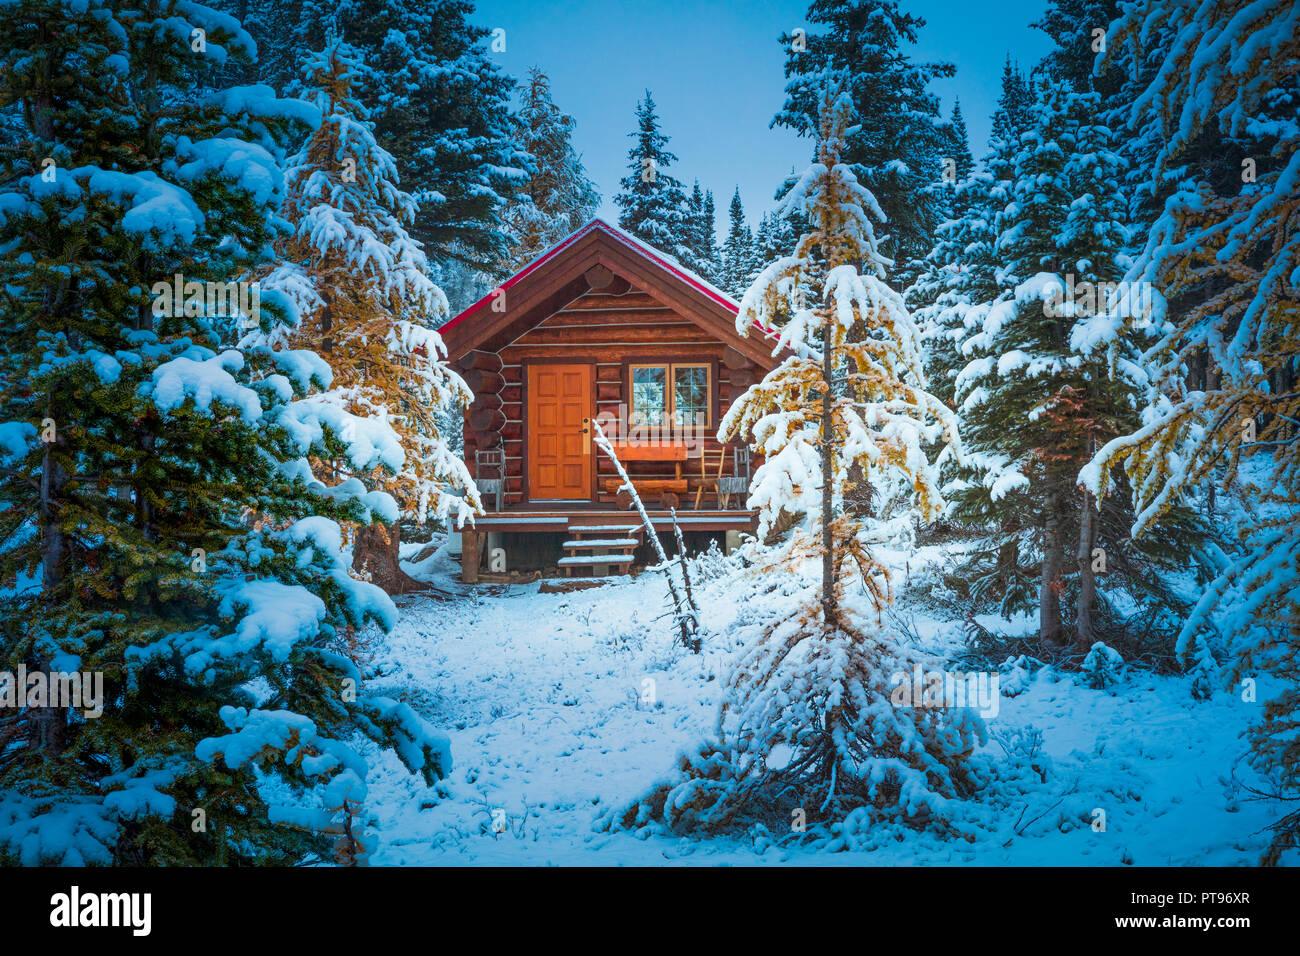 Mount Assiniboine Provincial Park ist ein Provincial Park in British Columbia, Kanada, um Mount Assiniboine gelegen. Stockbild